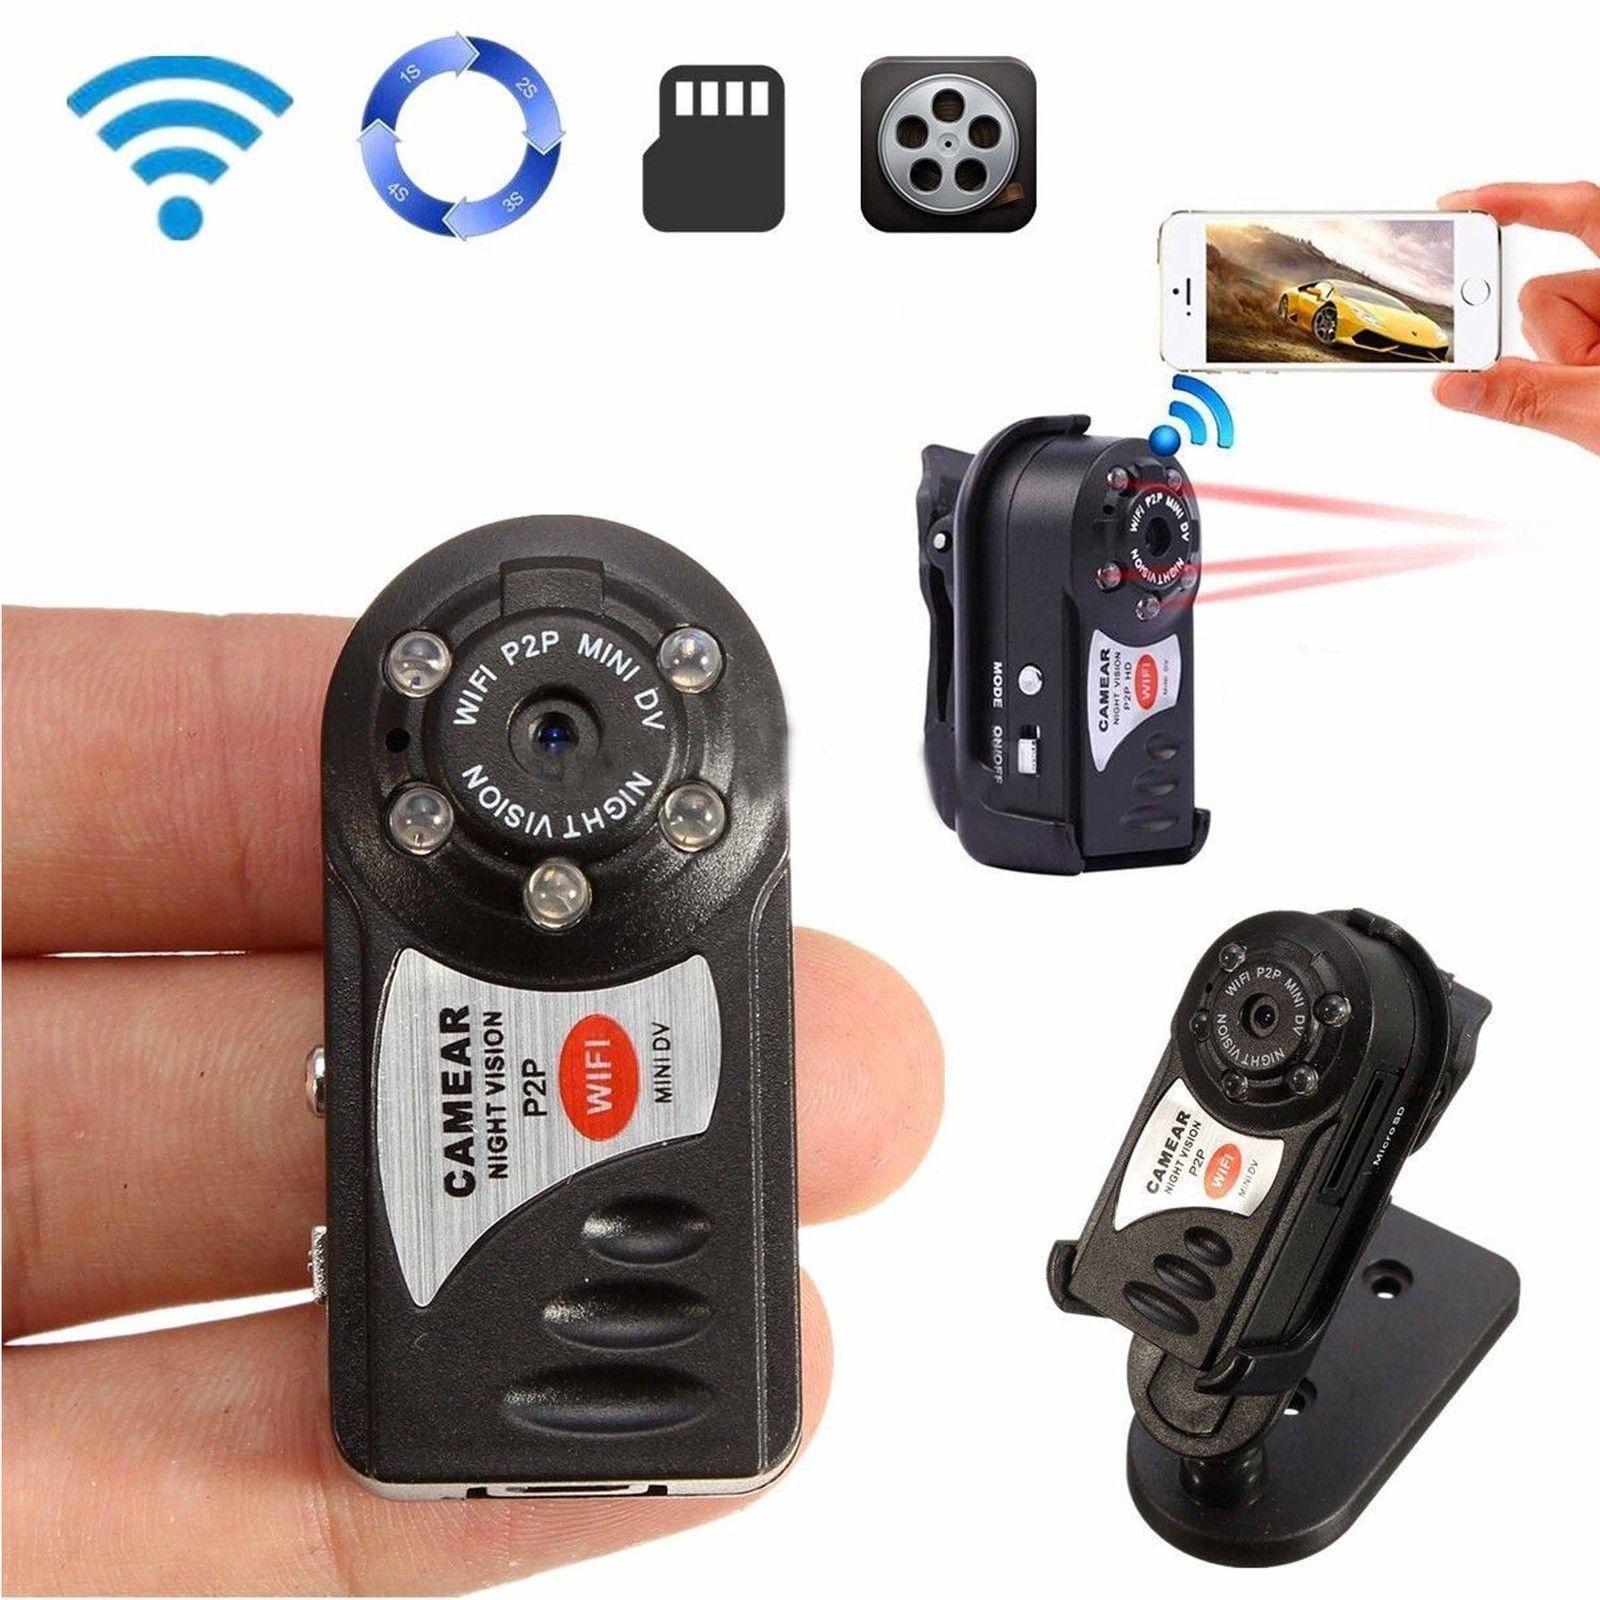 P2P لاسلكي عن بعد HD شبكة كاميرا الأشعة تحت الحمراء البسيطة مسجل فيديو 480P رؤية ليلية WIFI Q7 كاميرا رقمية صغيرة مصغرة DV كاميرا الفيديو